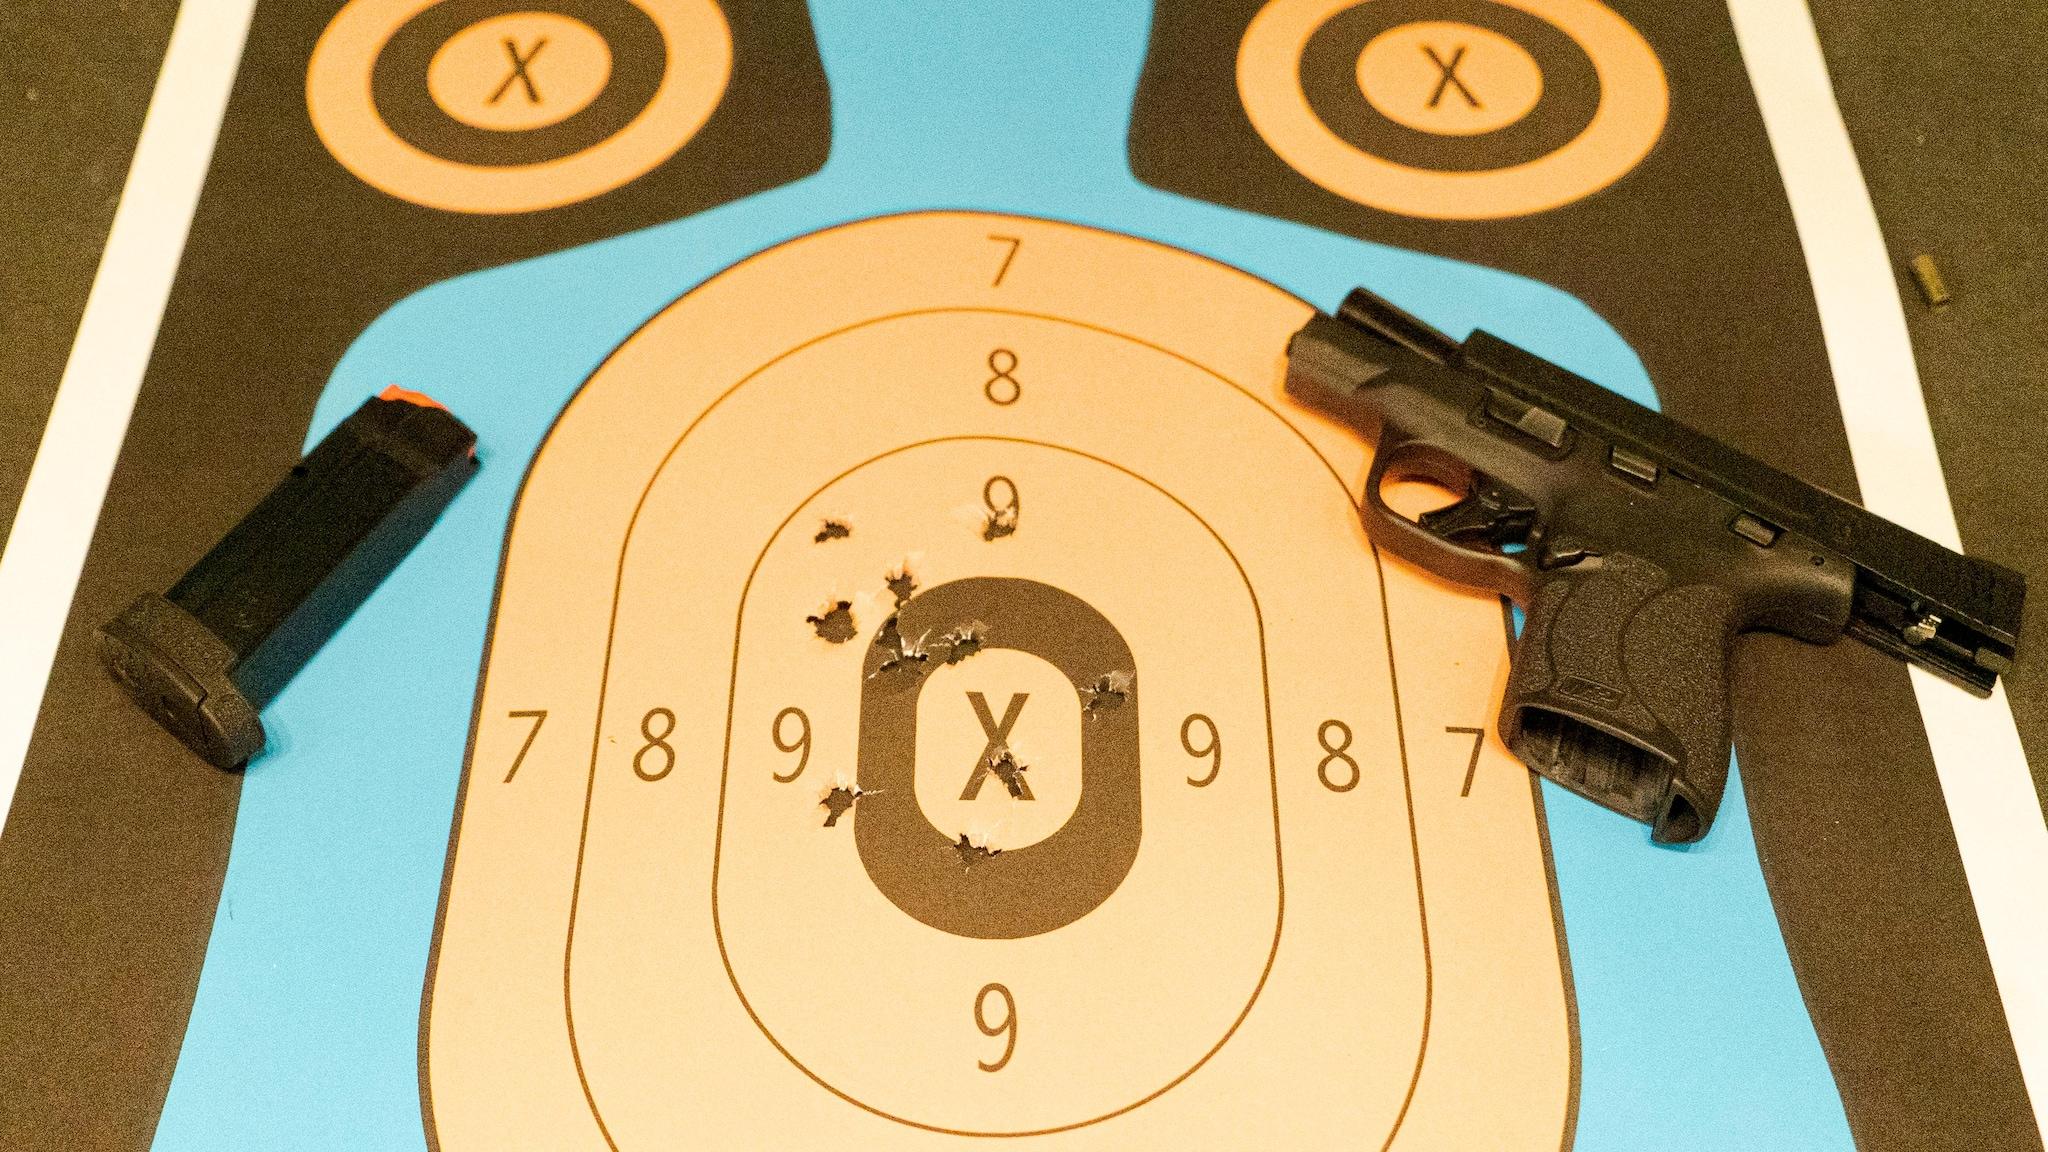 Smith & Wesson M&P 9 Shield Plus Range Target